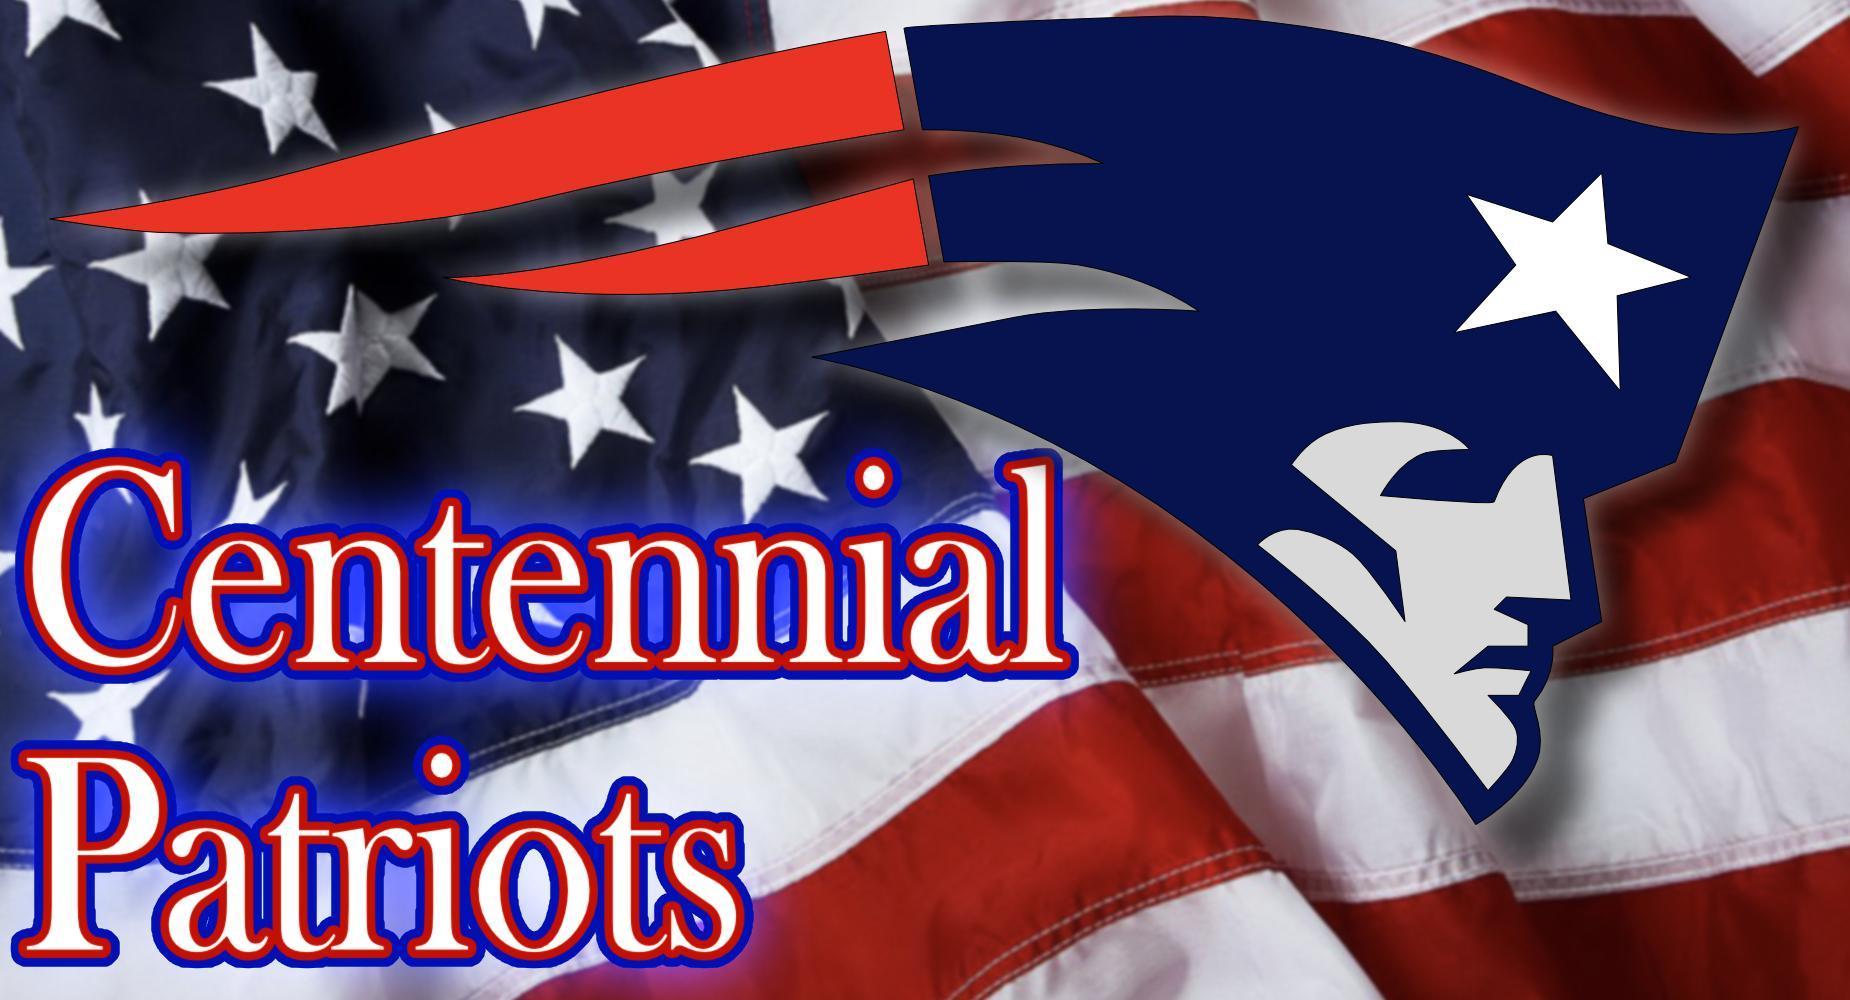 Centennial Patriots Logo